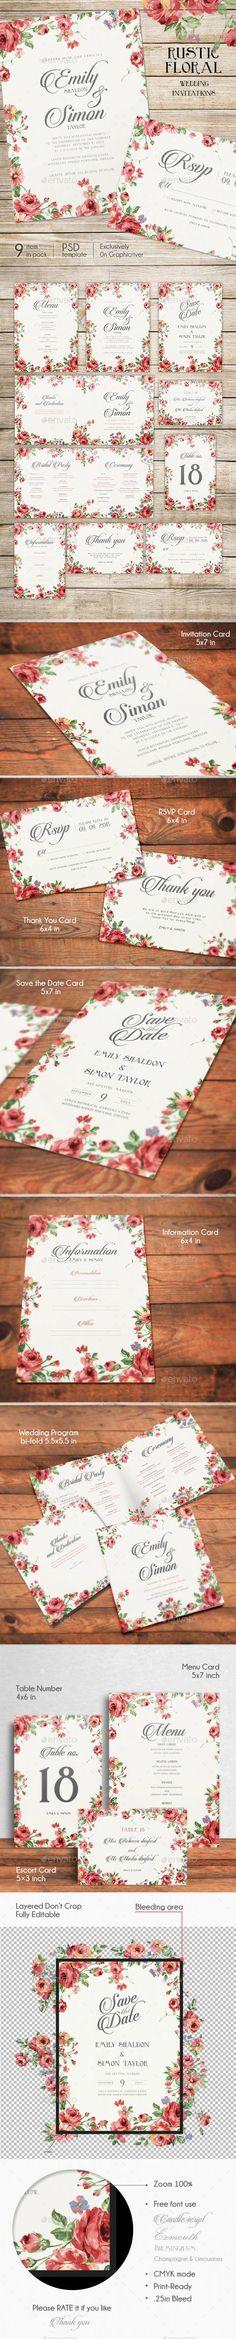 Rustic Floral Wedding Invitations  #template #cards #print #invites